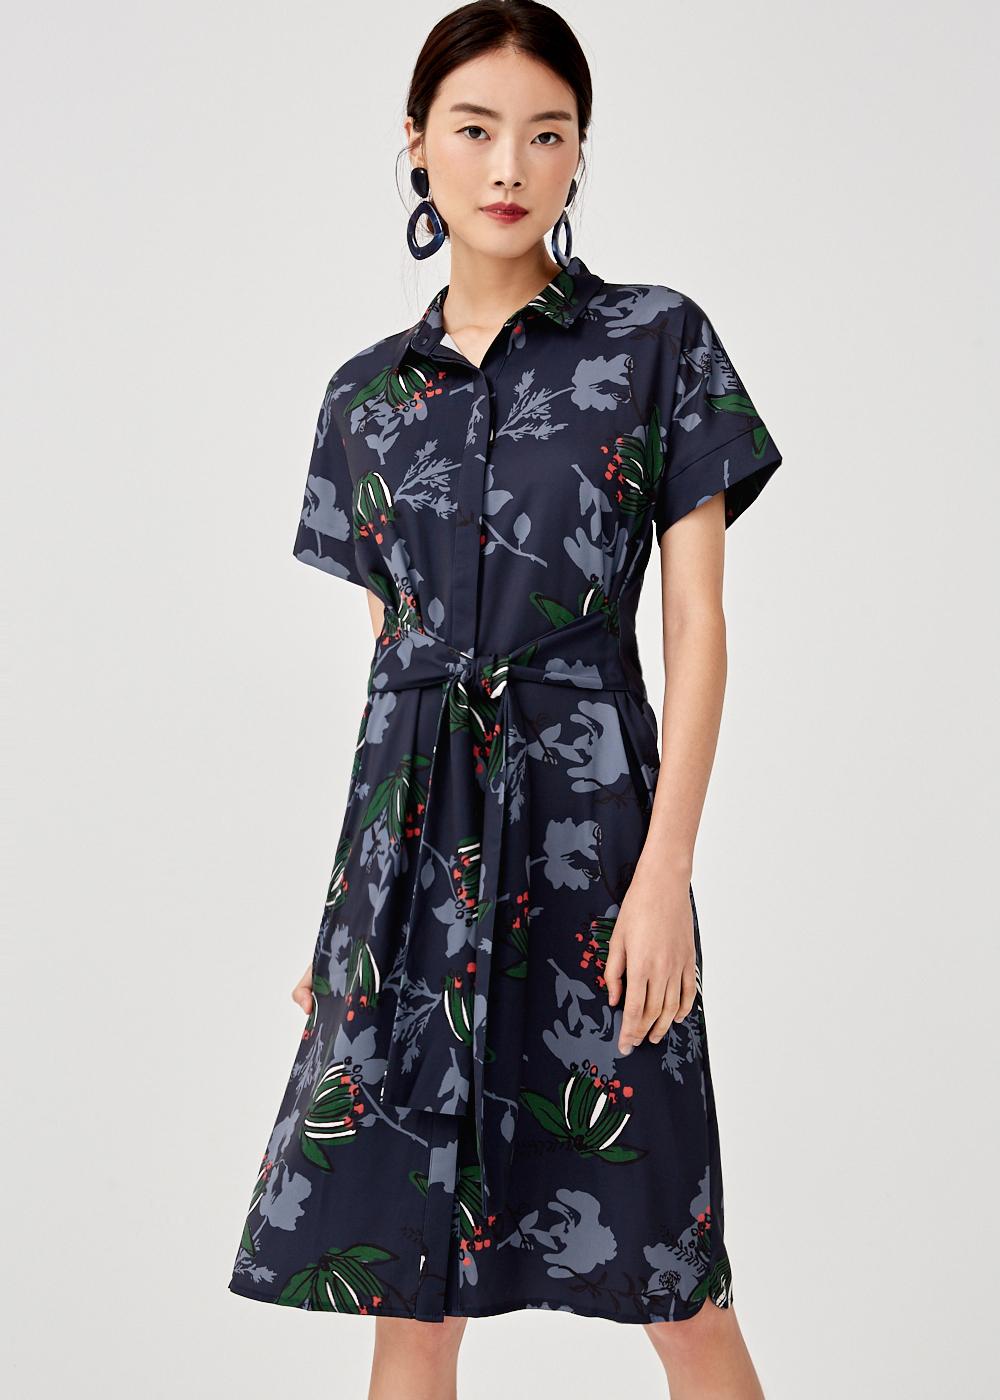 Breanna Tie Front Midi Shirt Dress in Honeysuckle Tea